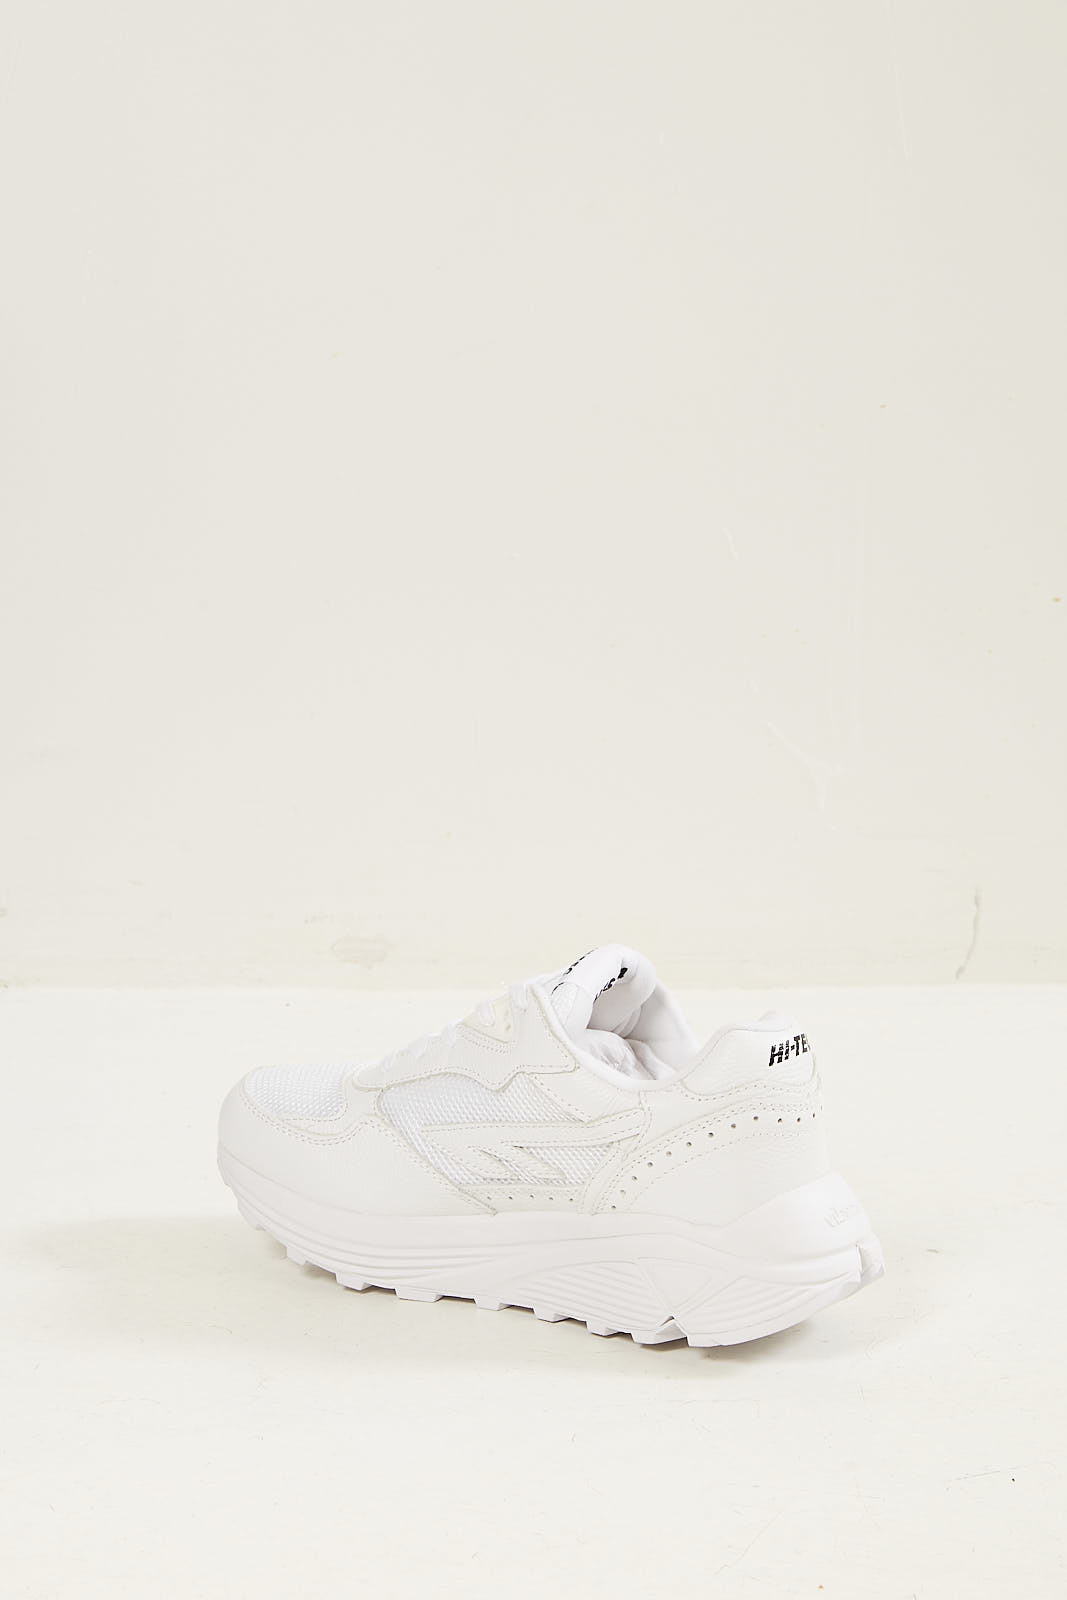 Hi-Tec - Hts silver shadow sneakers 017 white black